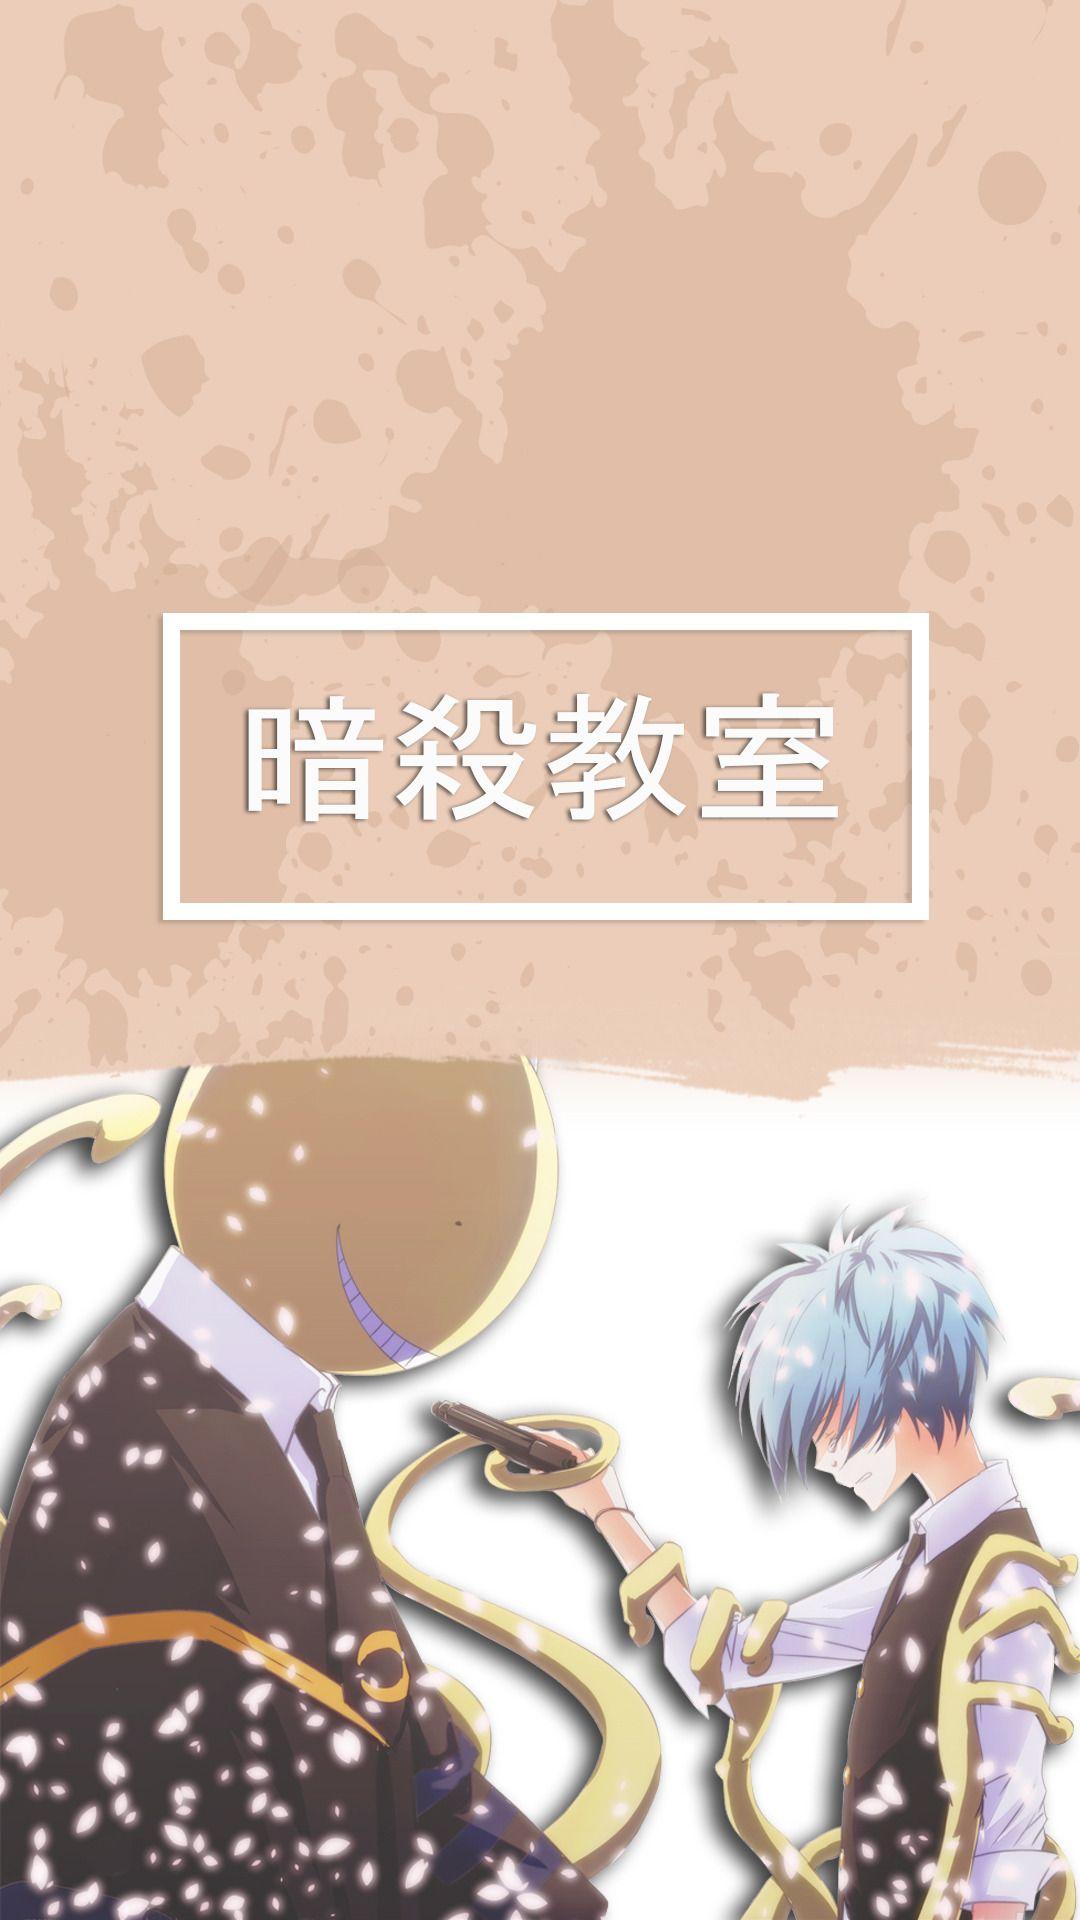 Wallpapers And Lockscreen Assassination Classroom Ansatsu Kyoushitsu Assassination Classroom Assasination Classroom Assassin